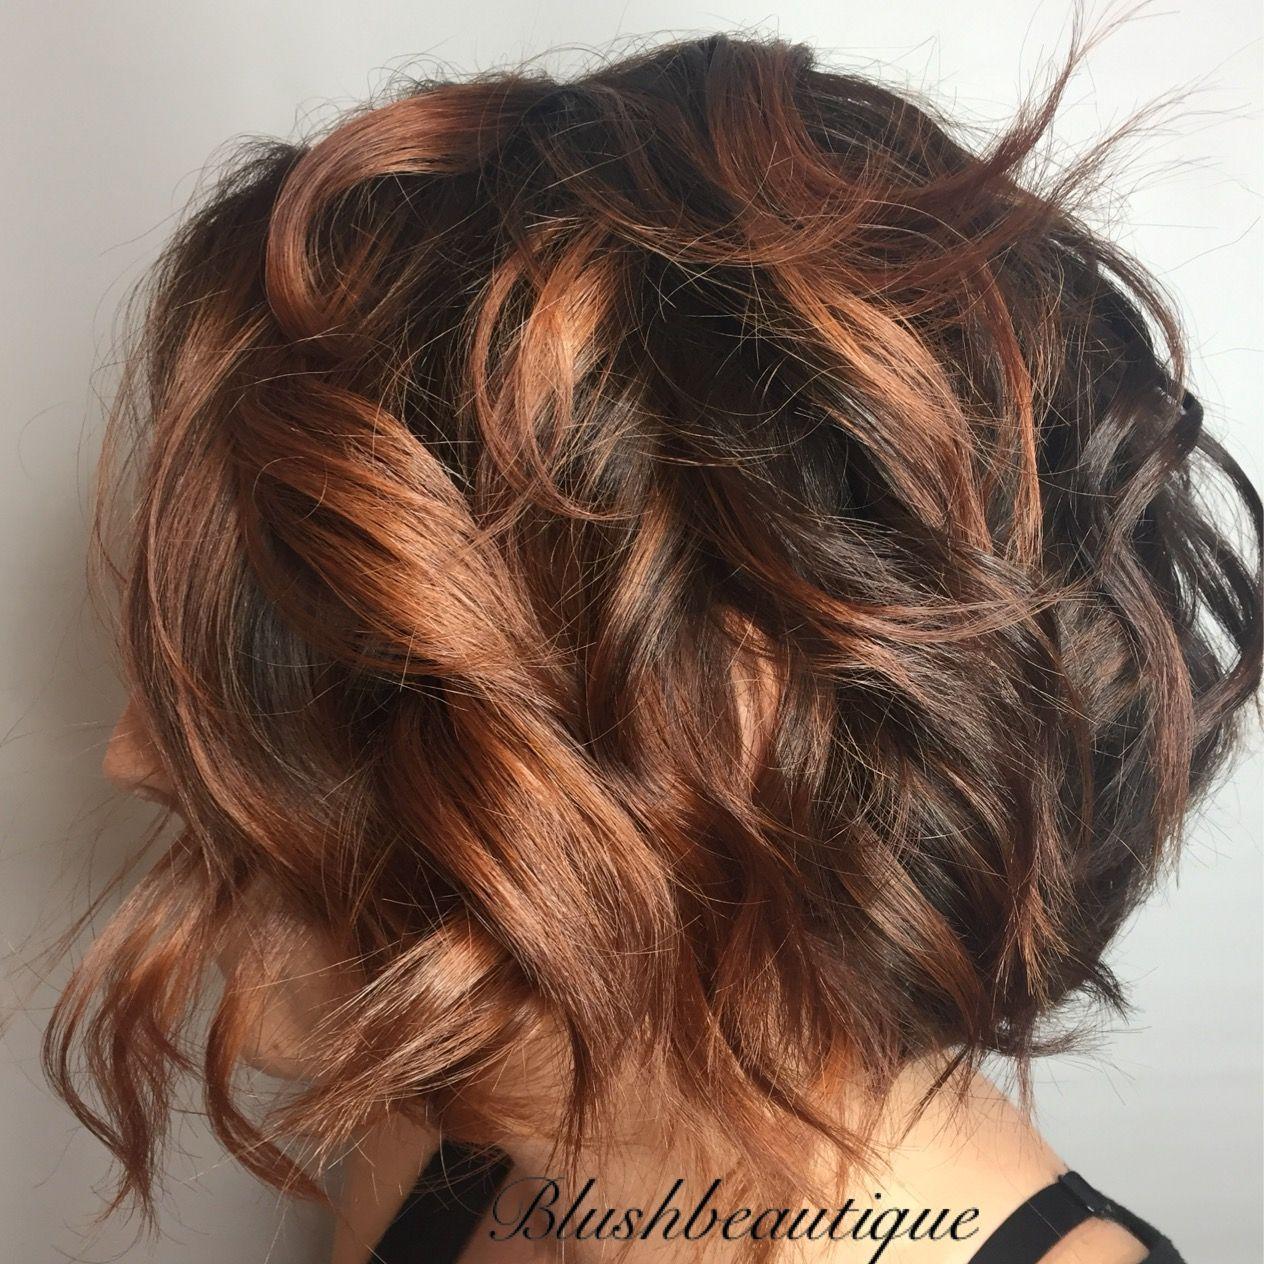 29++ 3d coiffure avis inspiration